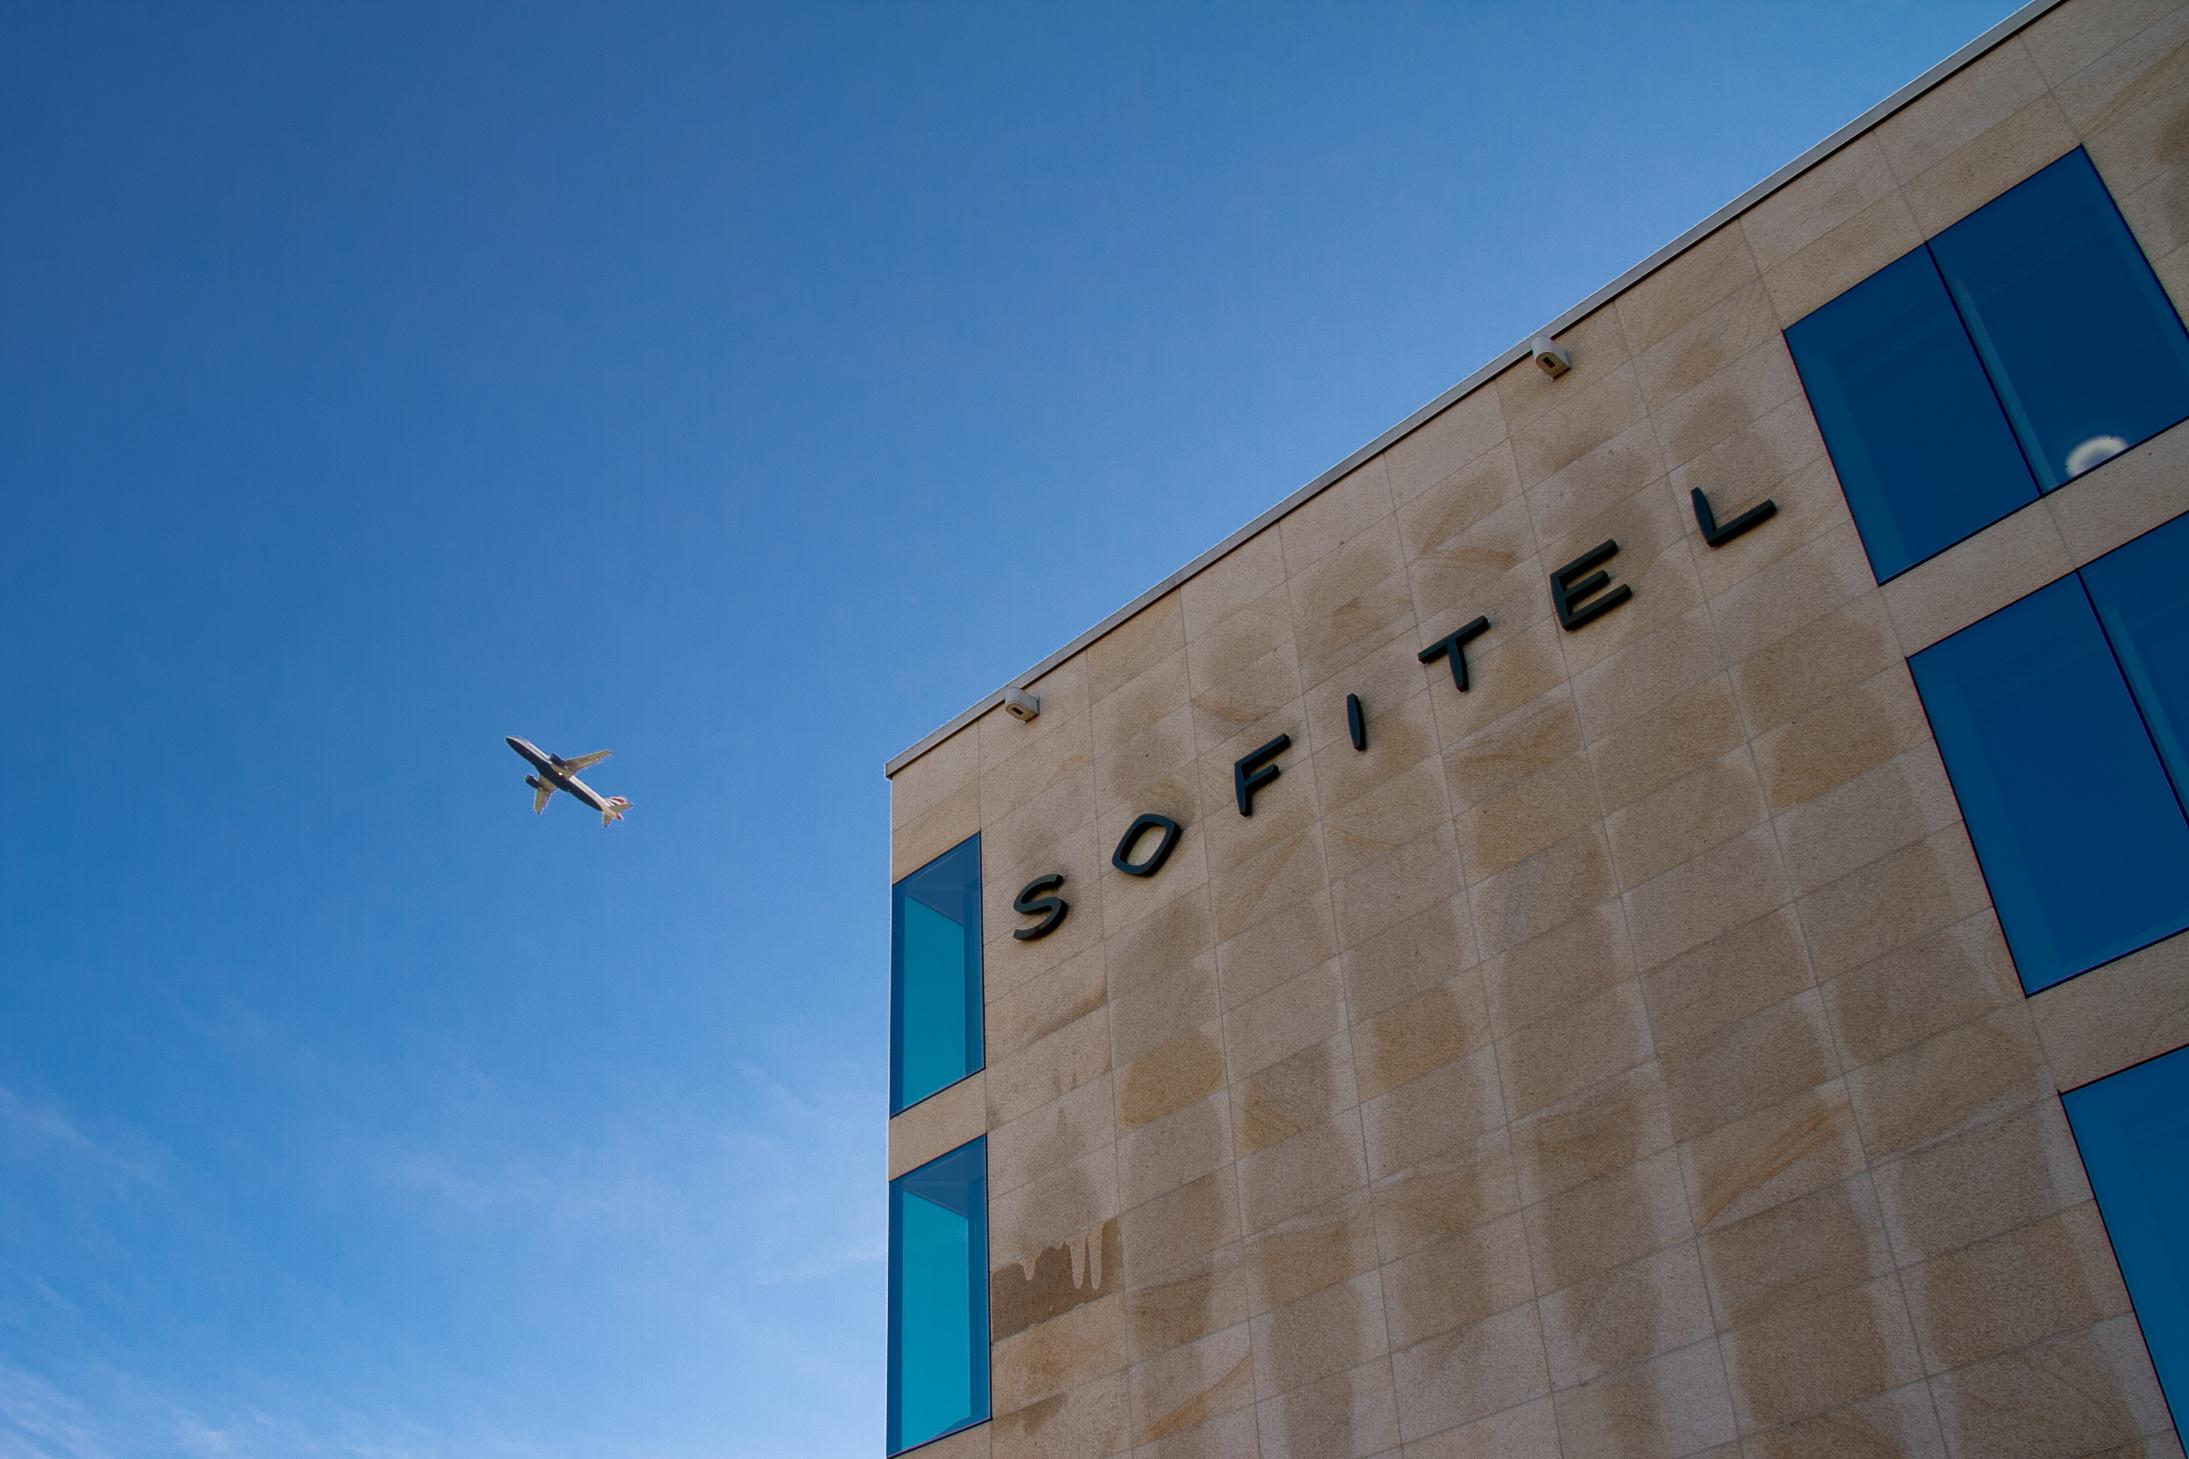 Airplane taking off right next to Sofitel hotel London Heathrow